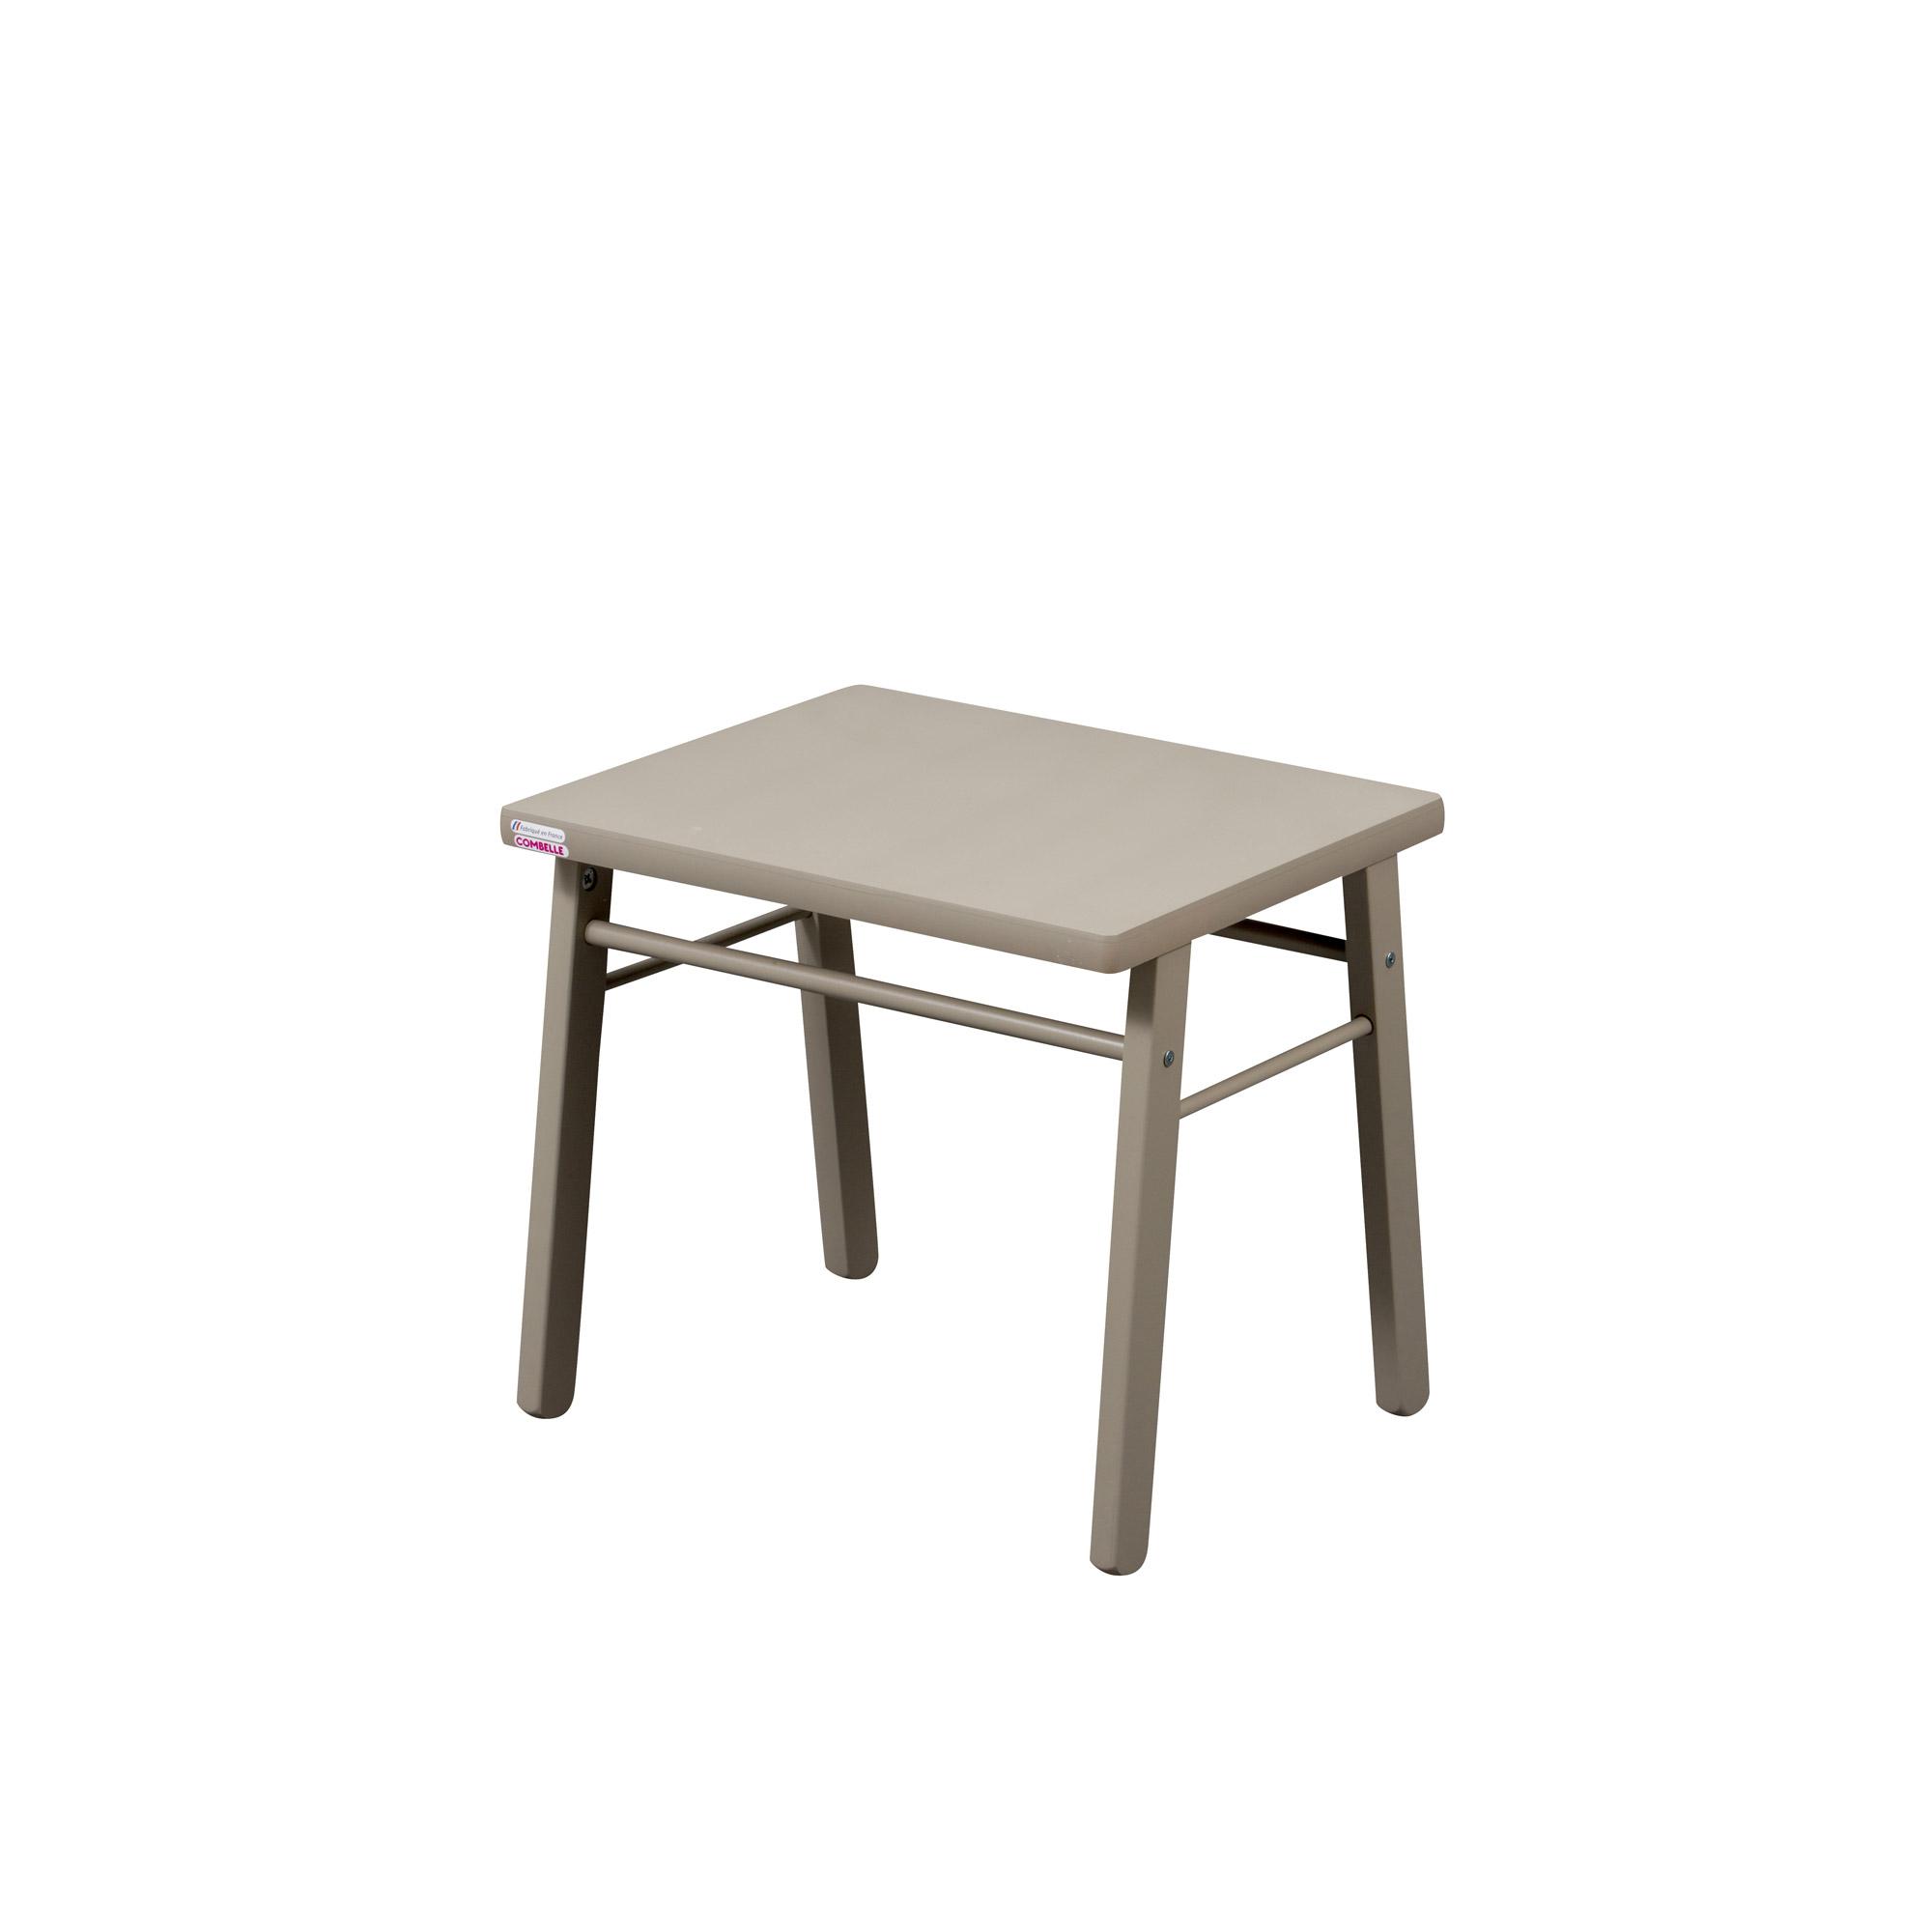 table d 39 enfant gris clair. Black Bedroom Furniture Sets. Home Design Ideas